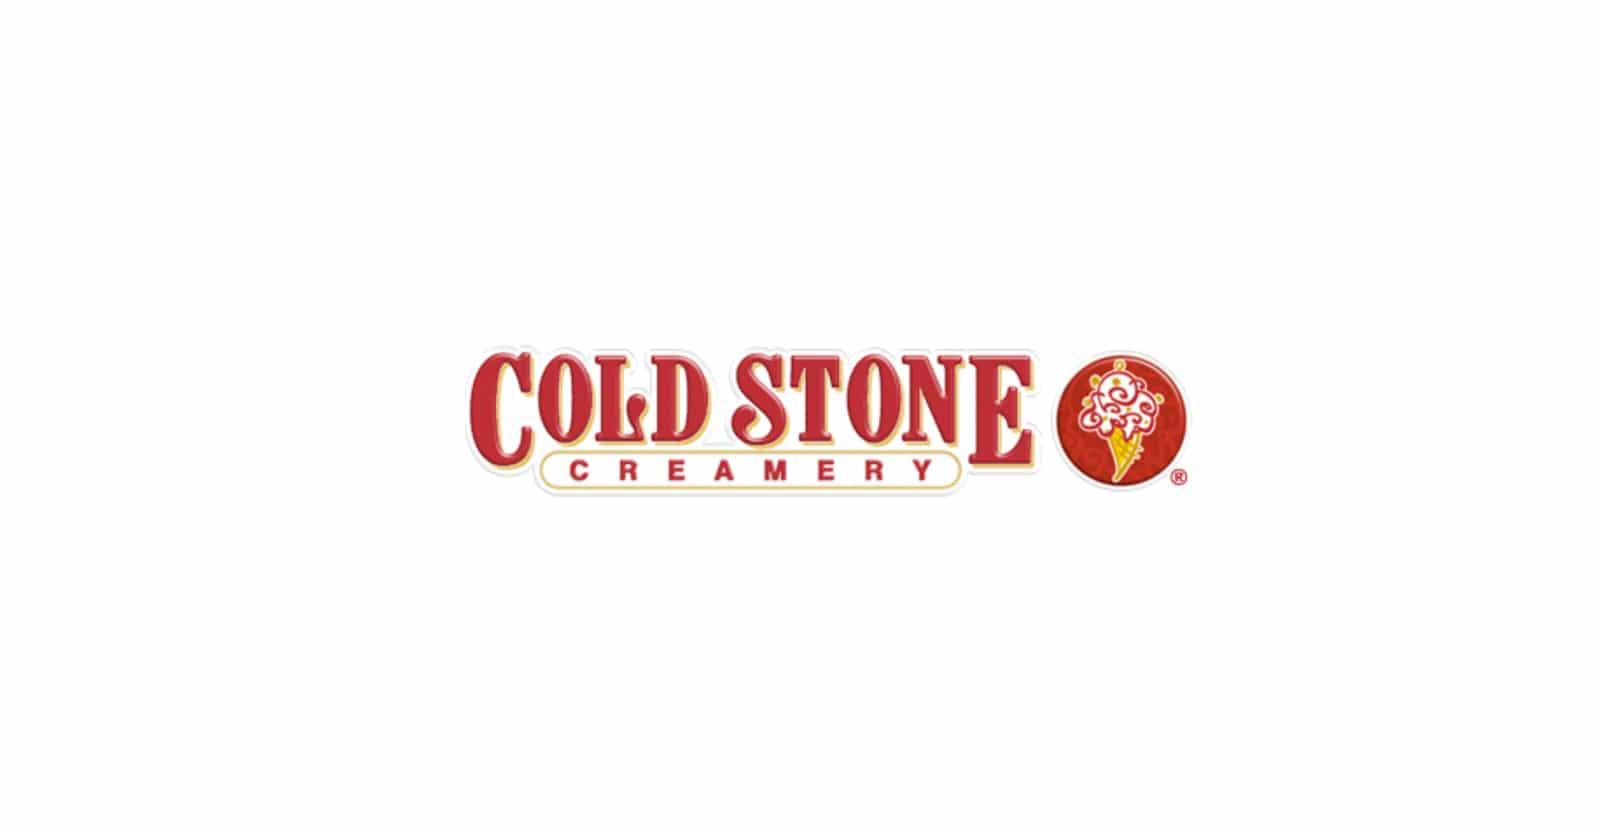 cold stone creamery gluten-free menu